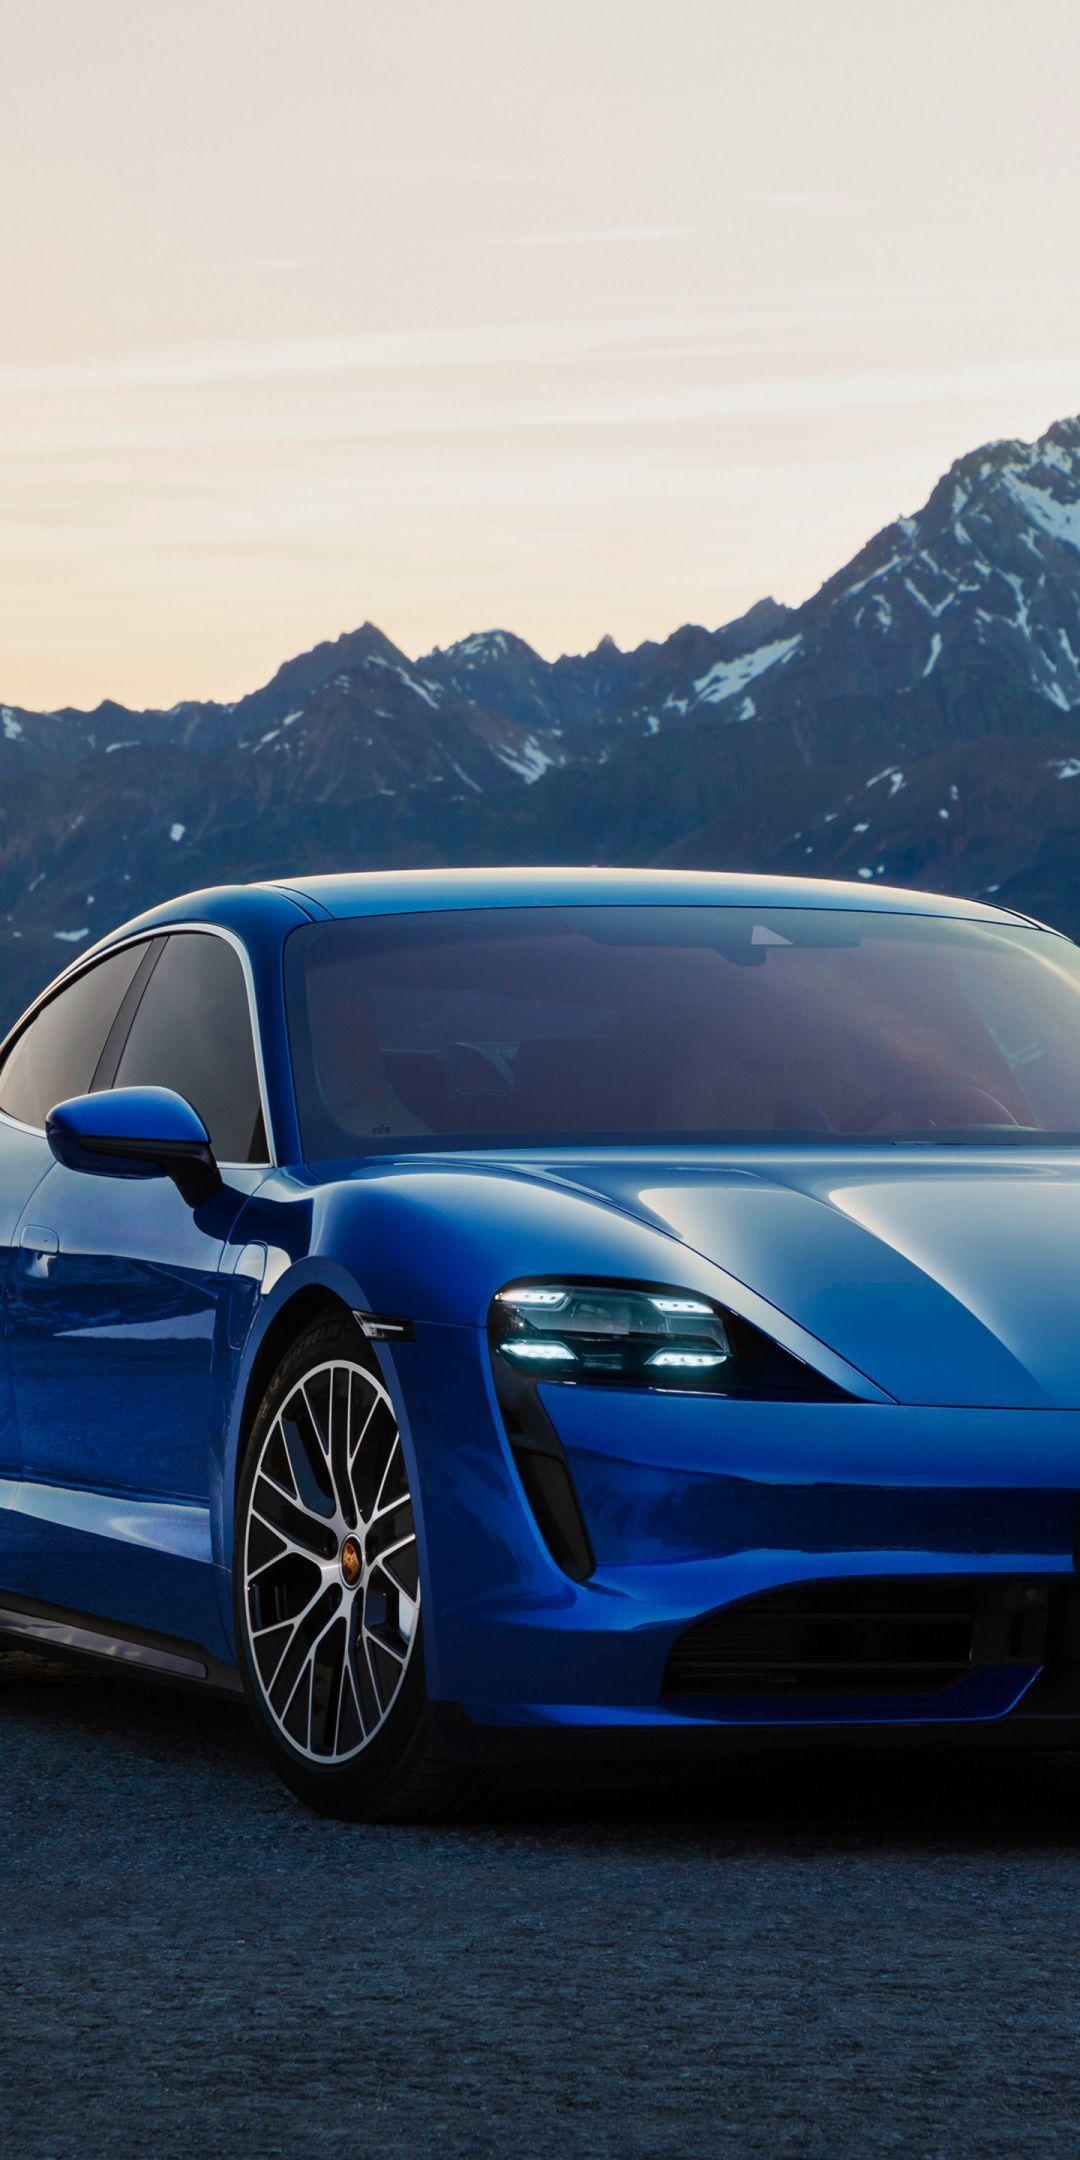 1080x2160 Blue car, Porsche Taycan Turbo, 2019 wallpaper